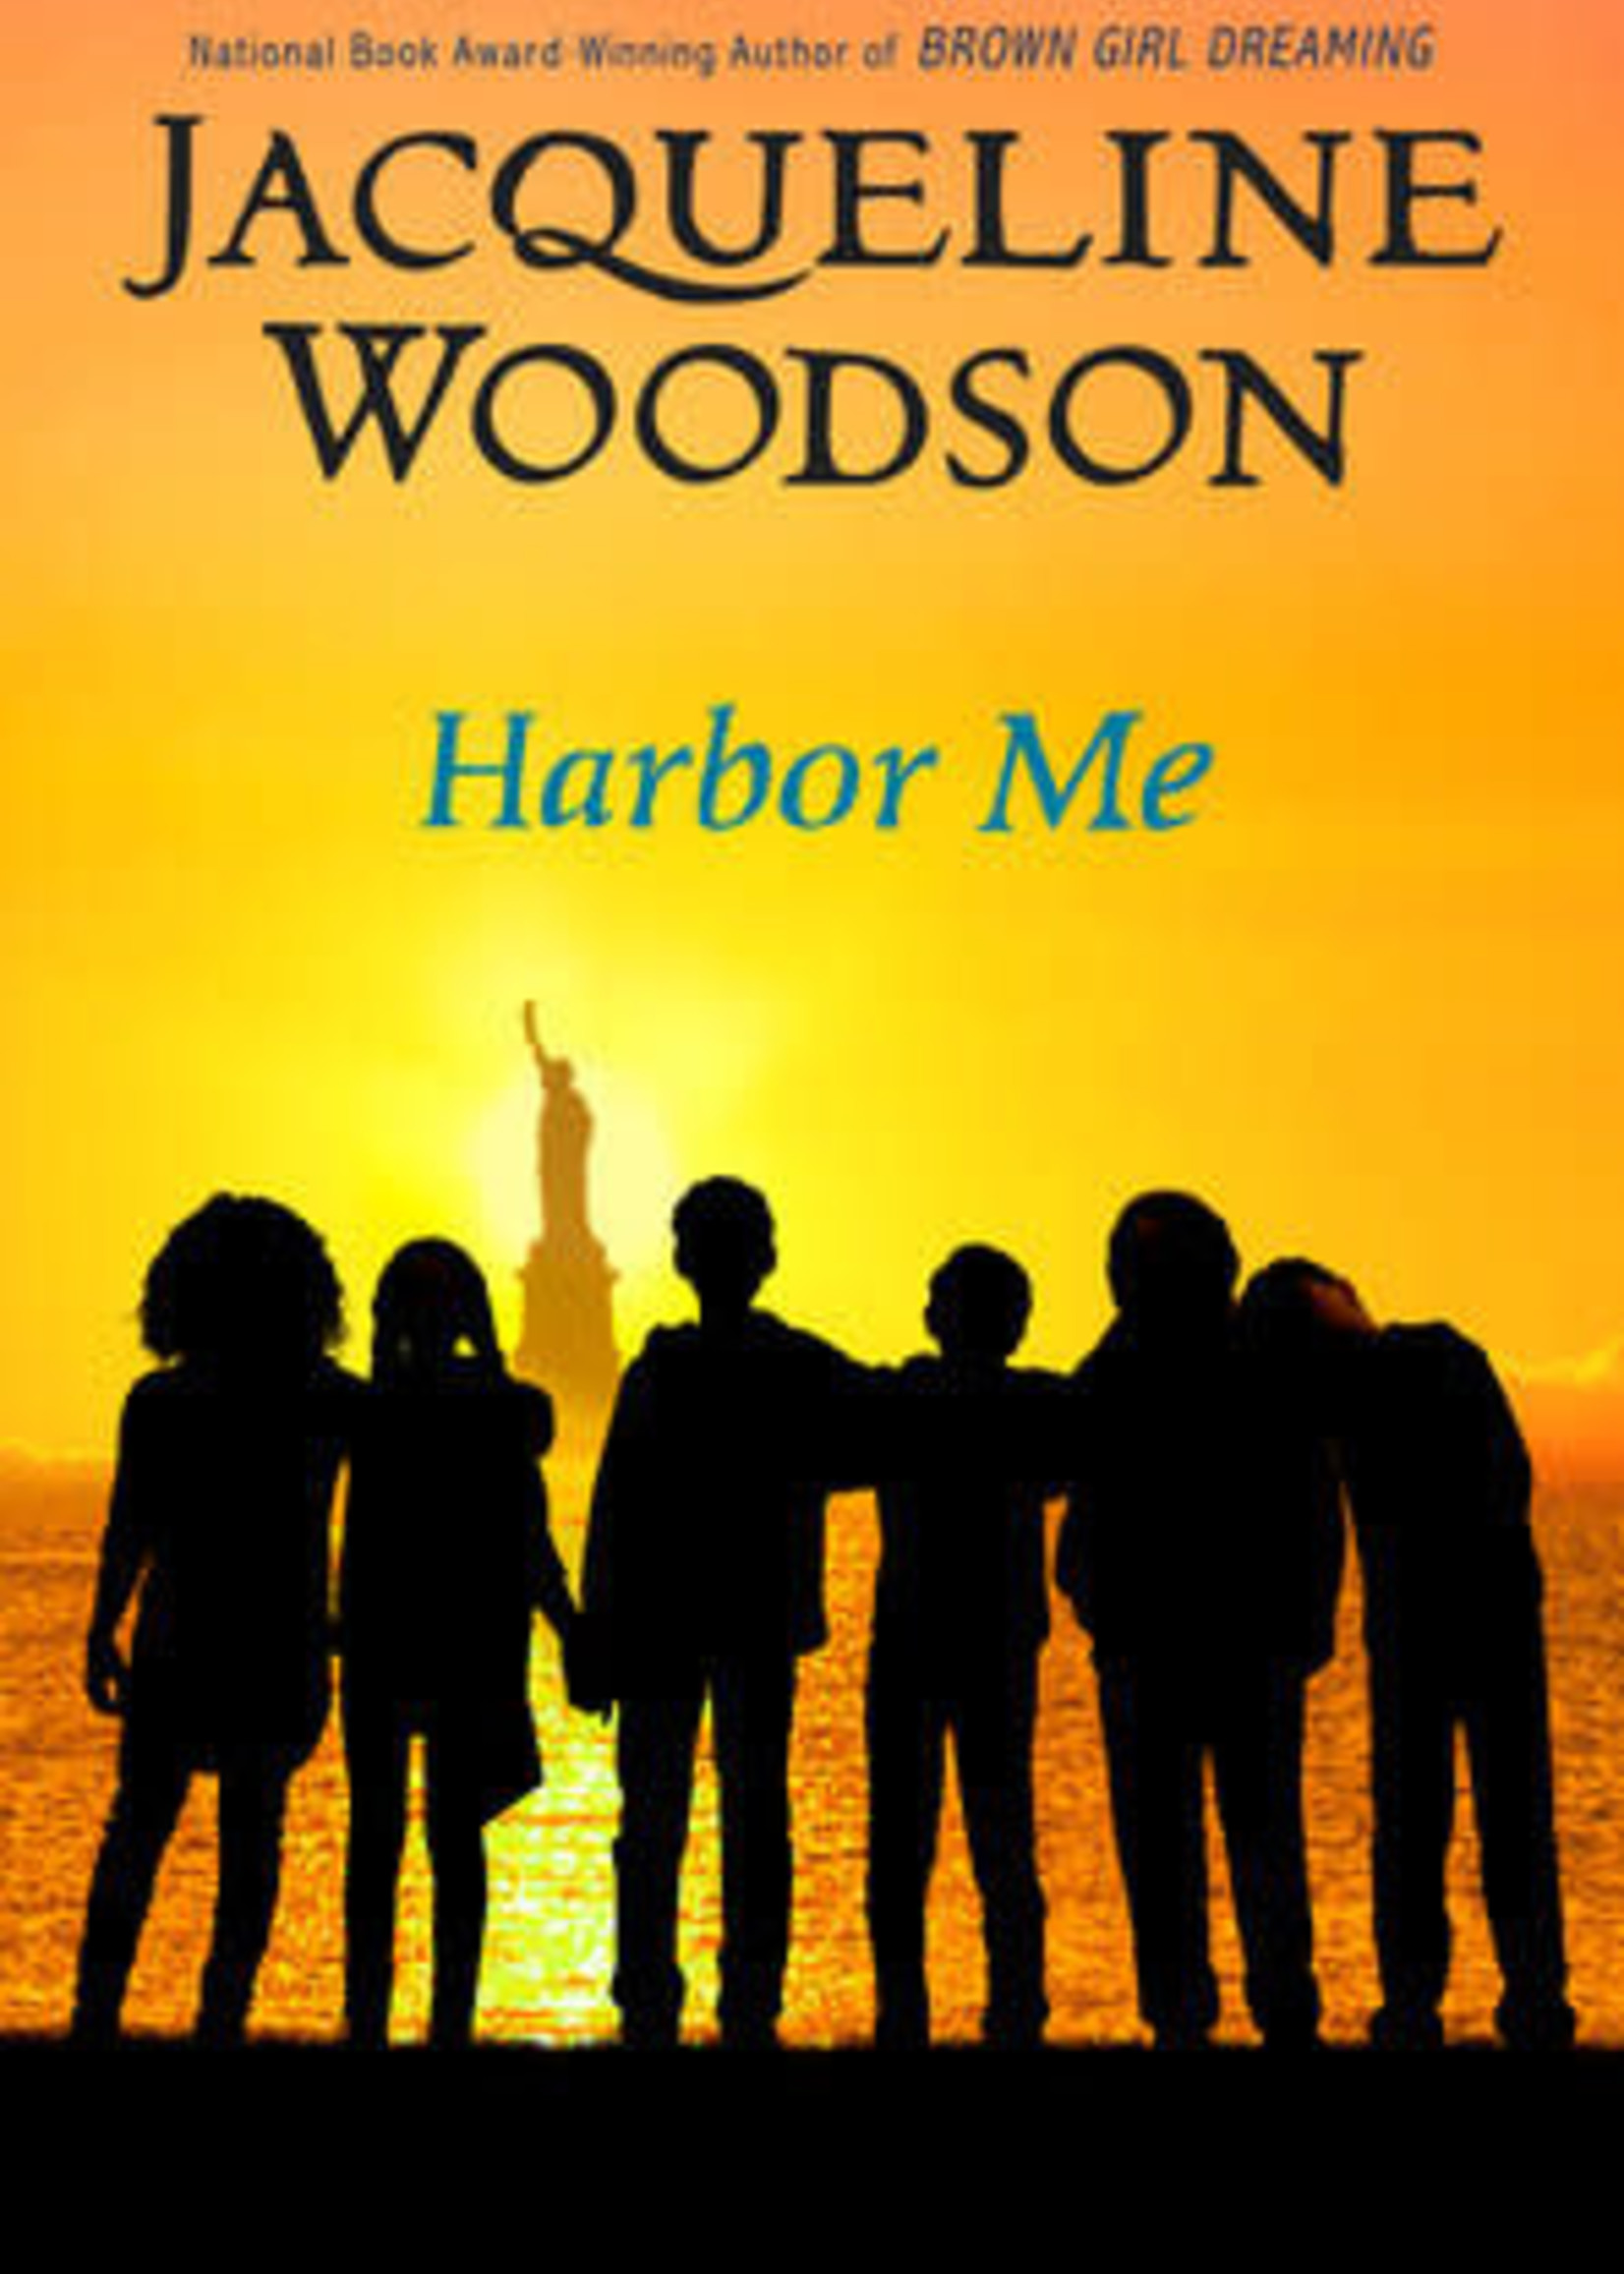 Harbor Me - Hardcover